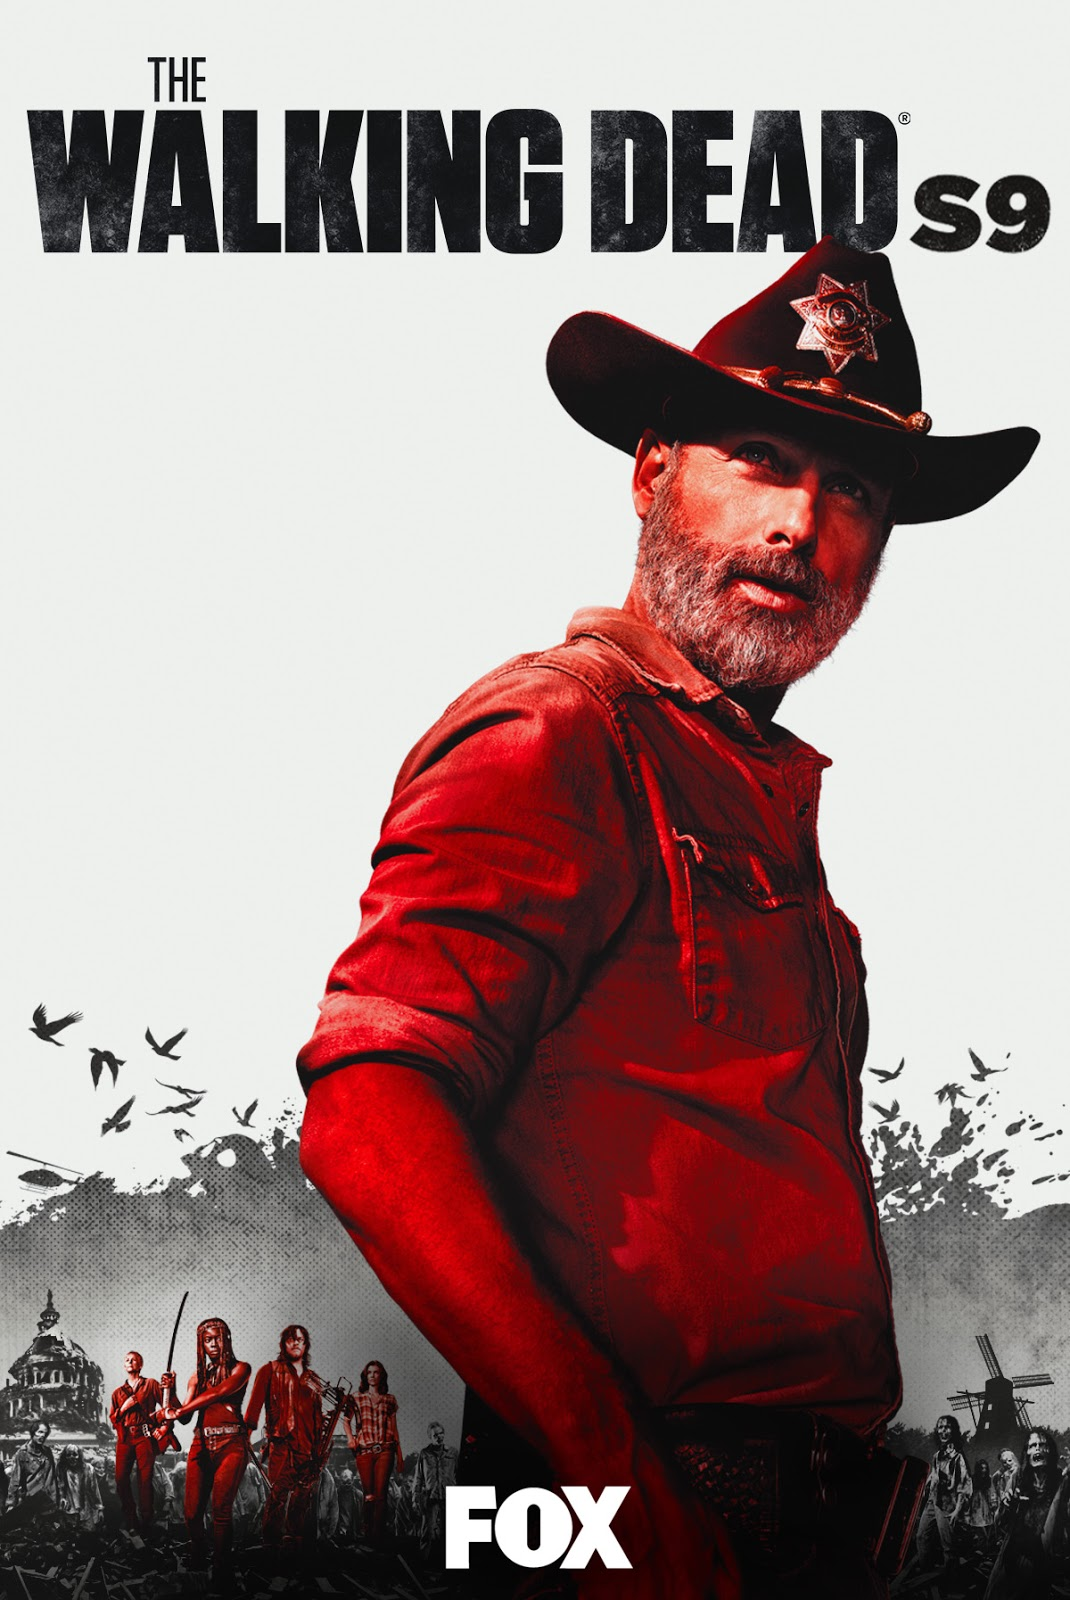 The Walking Dead [Season 9] [2019] [DVDR] [R1] [NTSC] [Latino] [5 DISC]